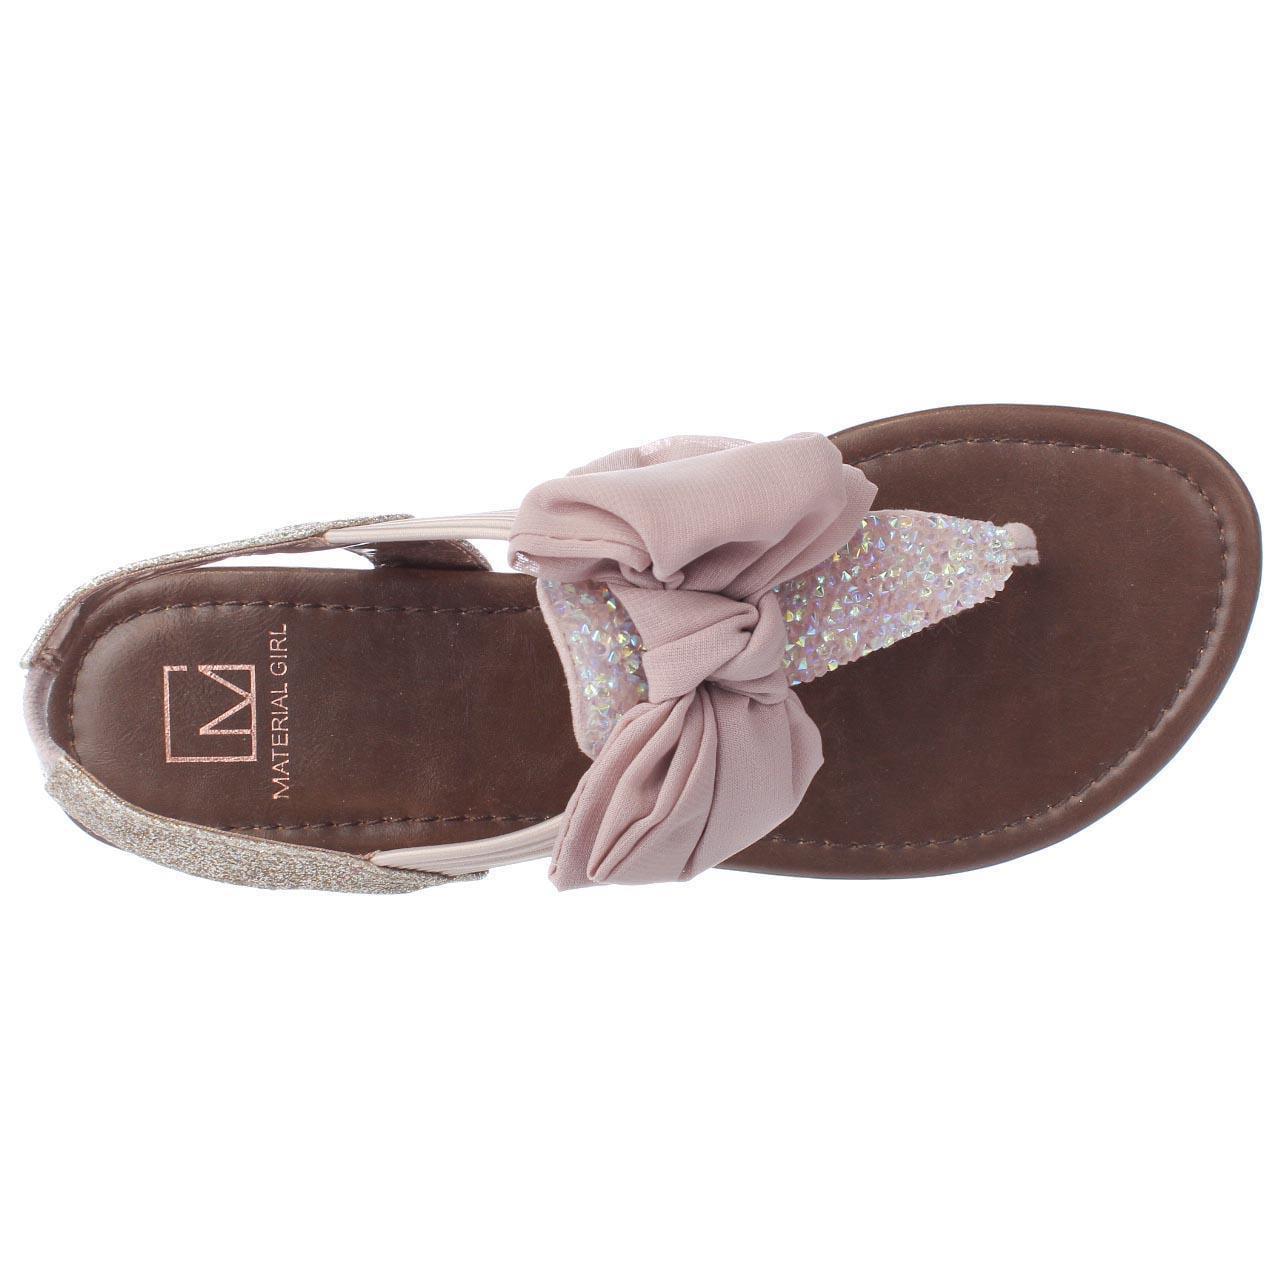 Womens MG35 Swan Bow T-Strap Sandals - Blush